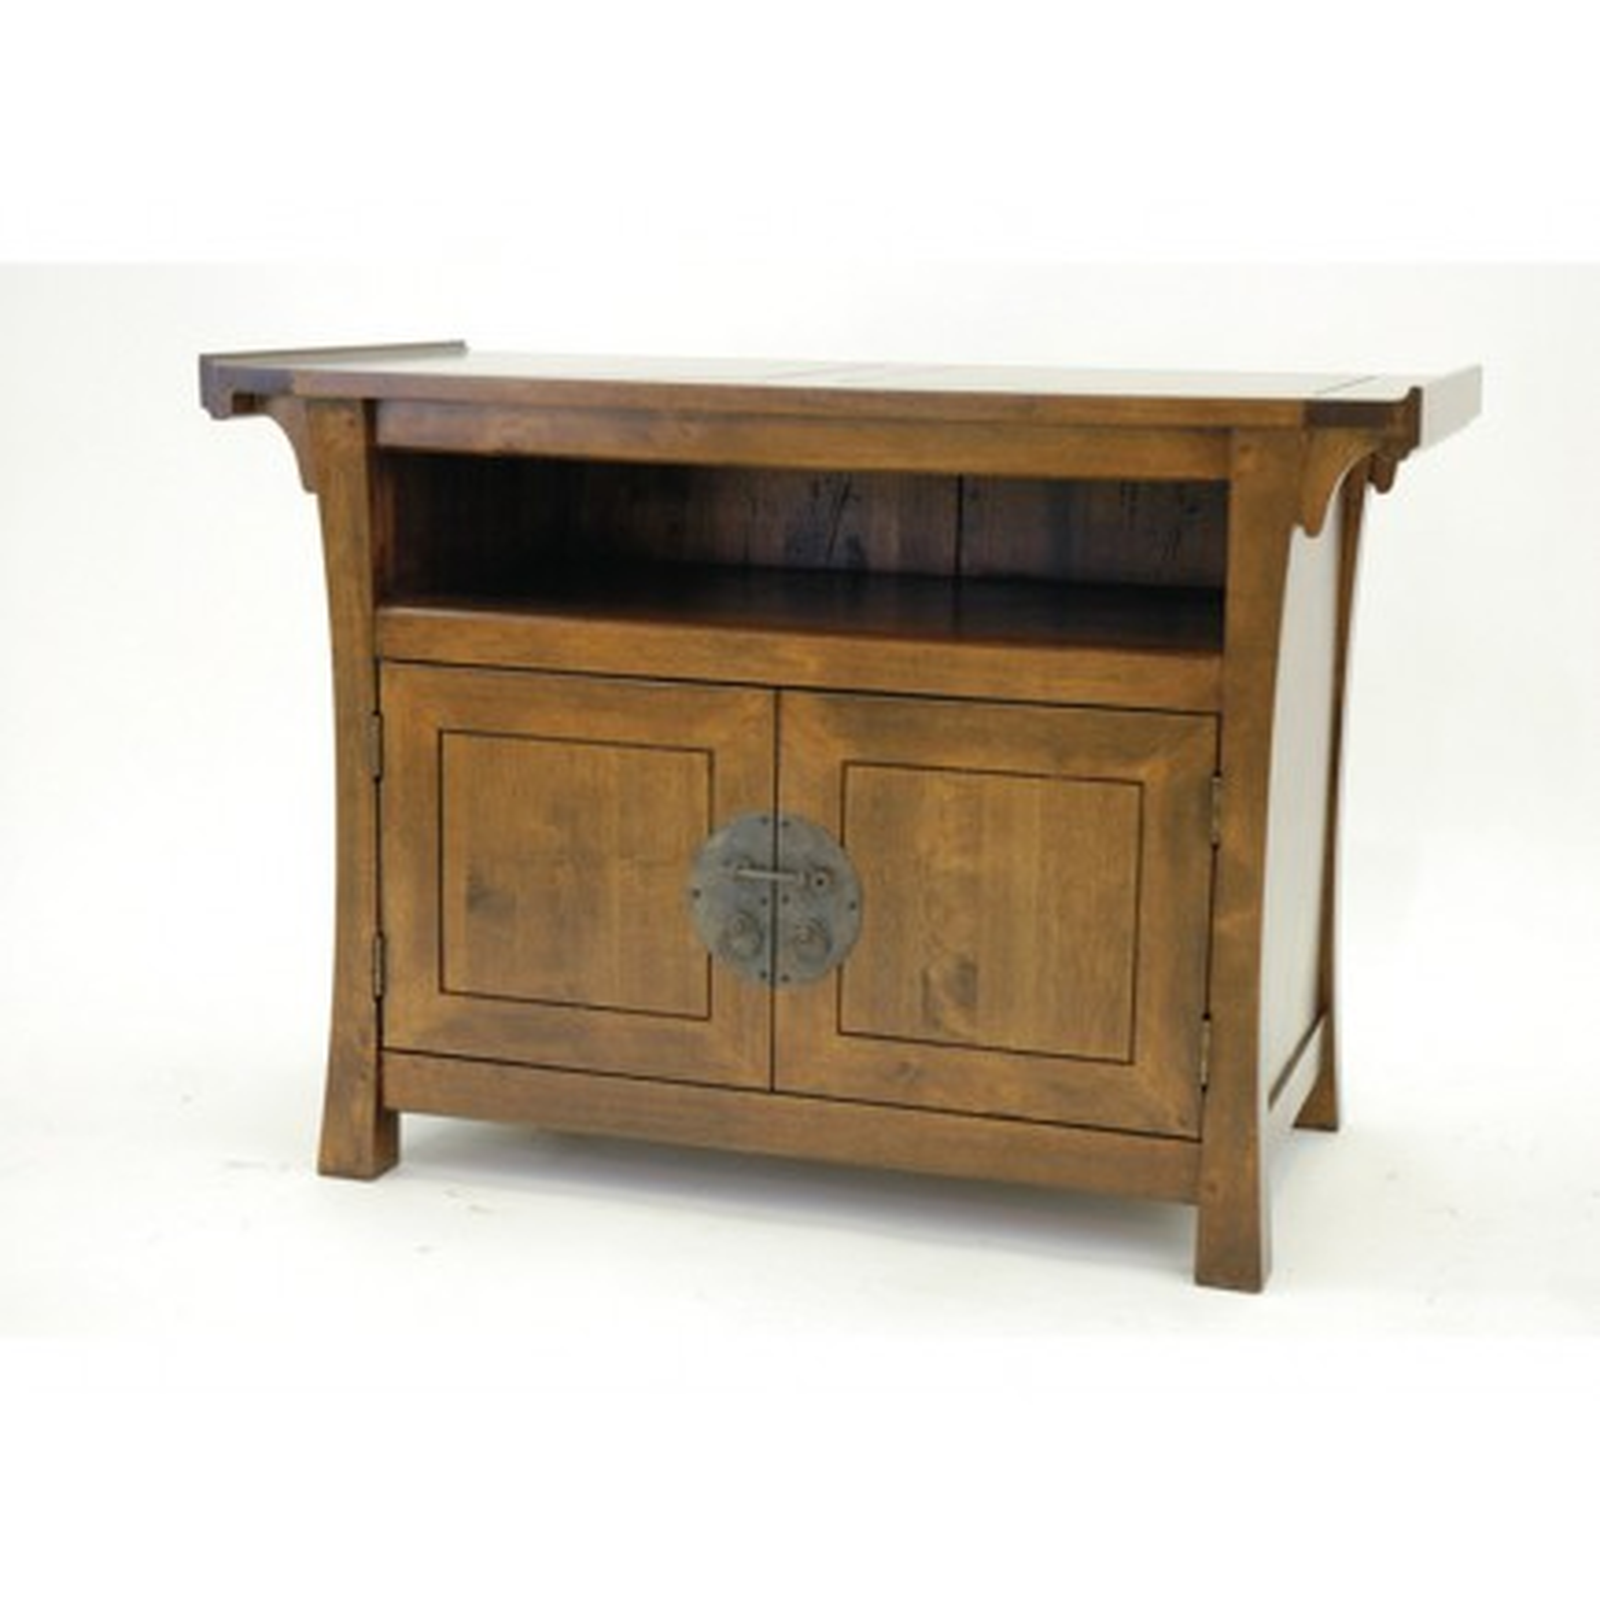 Meuble Tv Hifi Chine Hévéa - meuble bois exotique